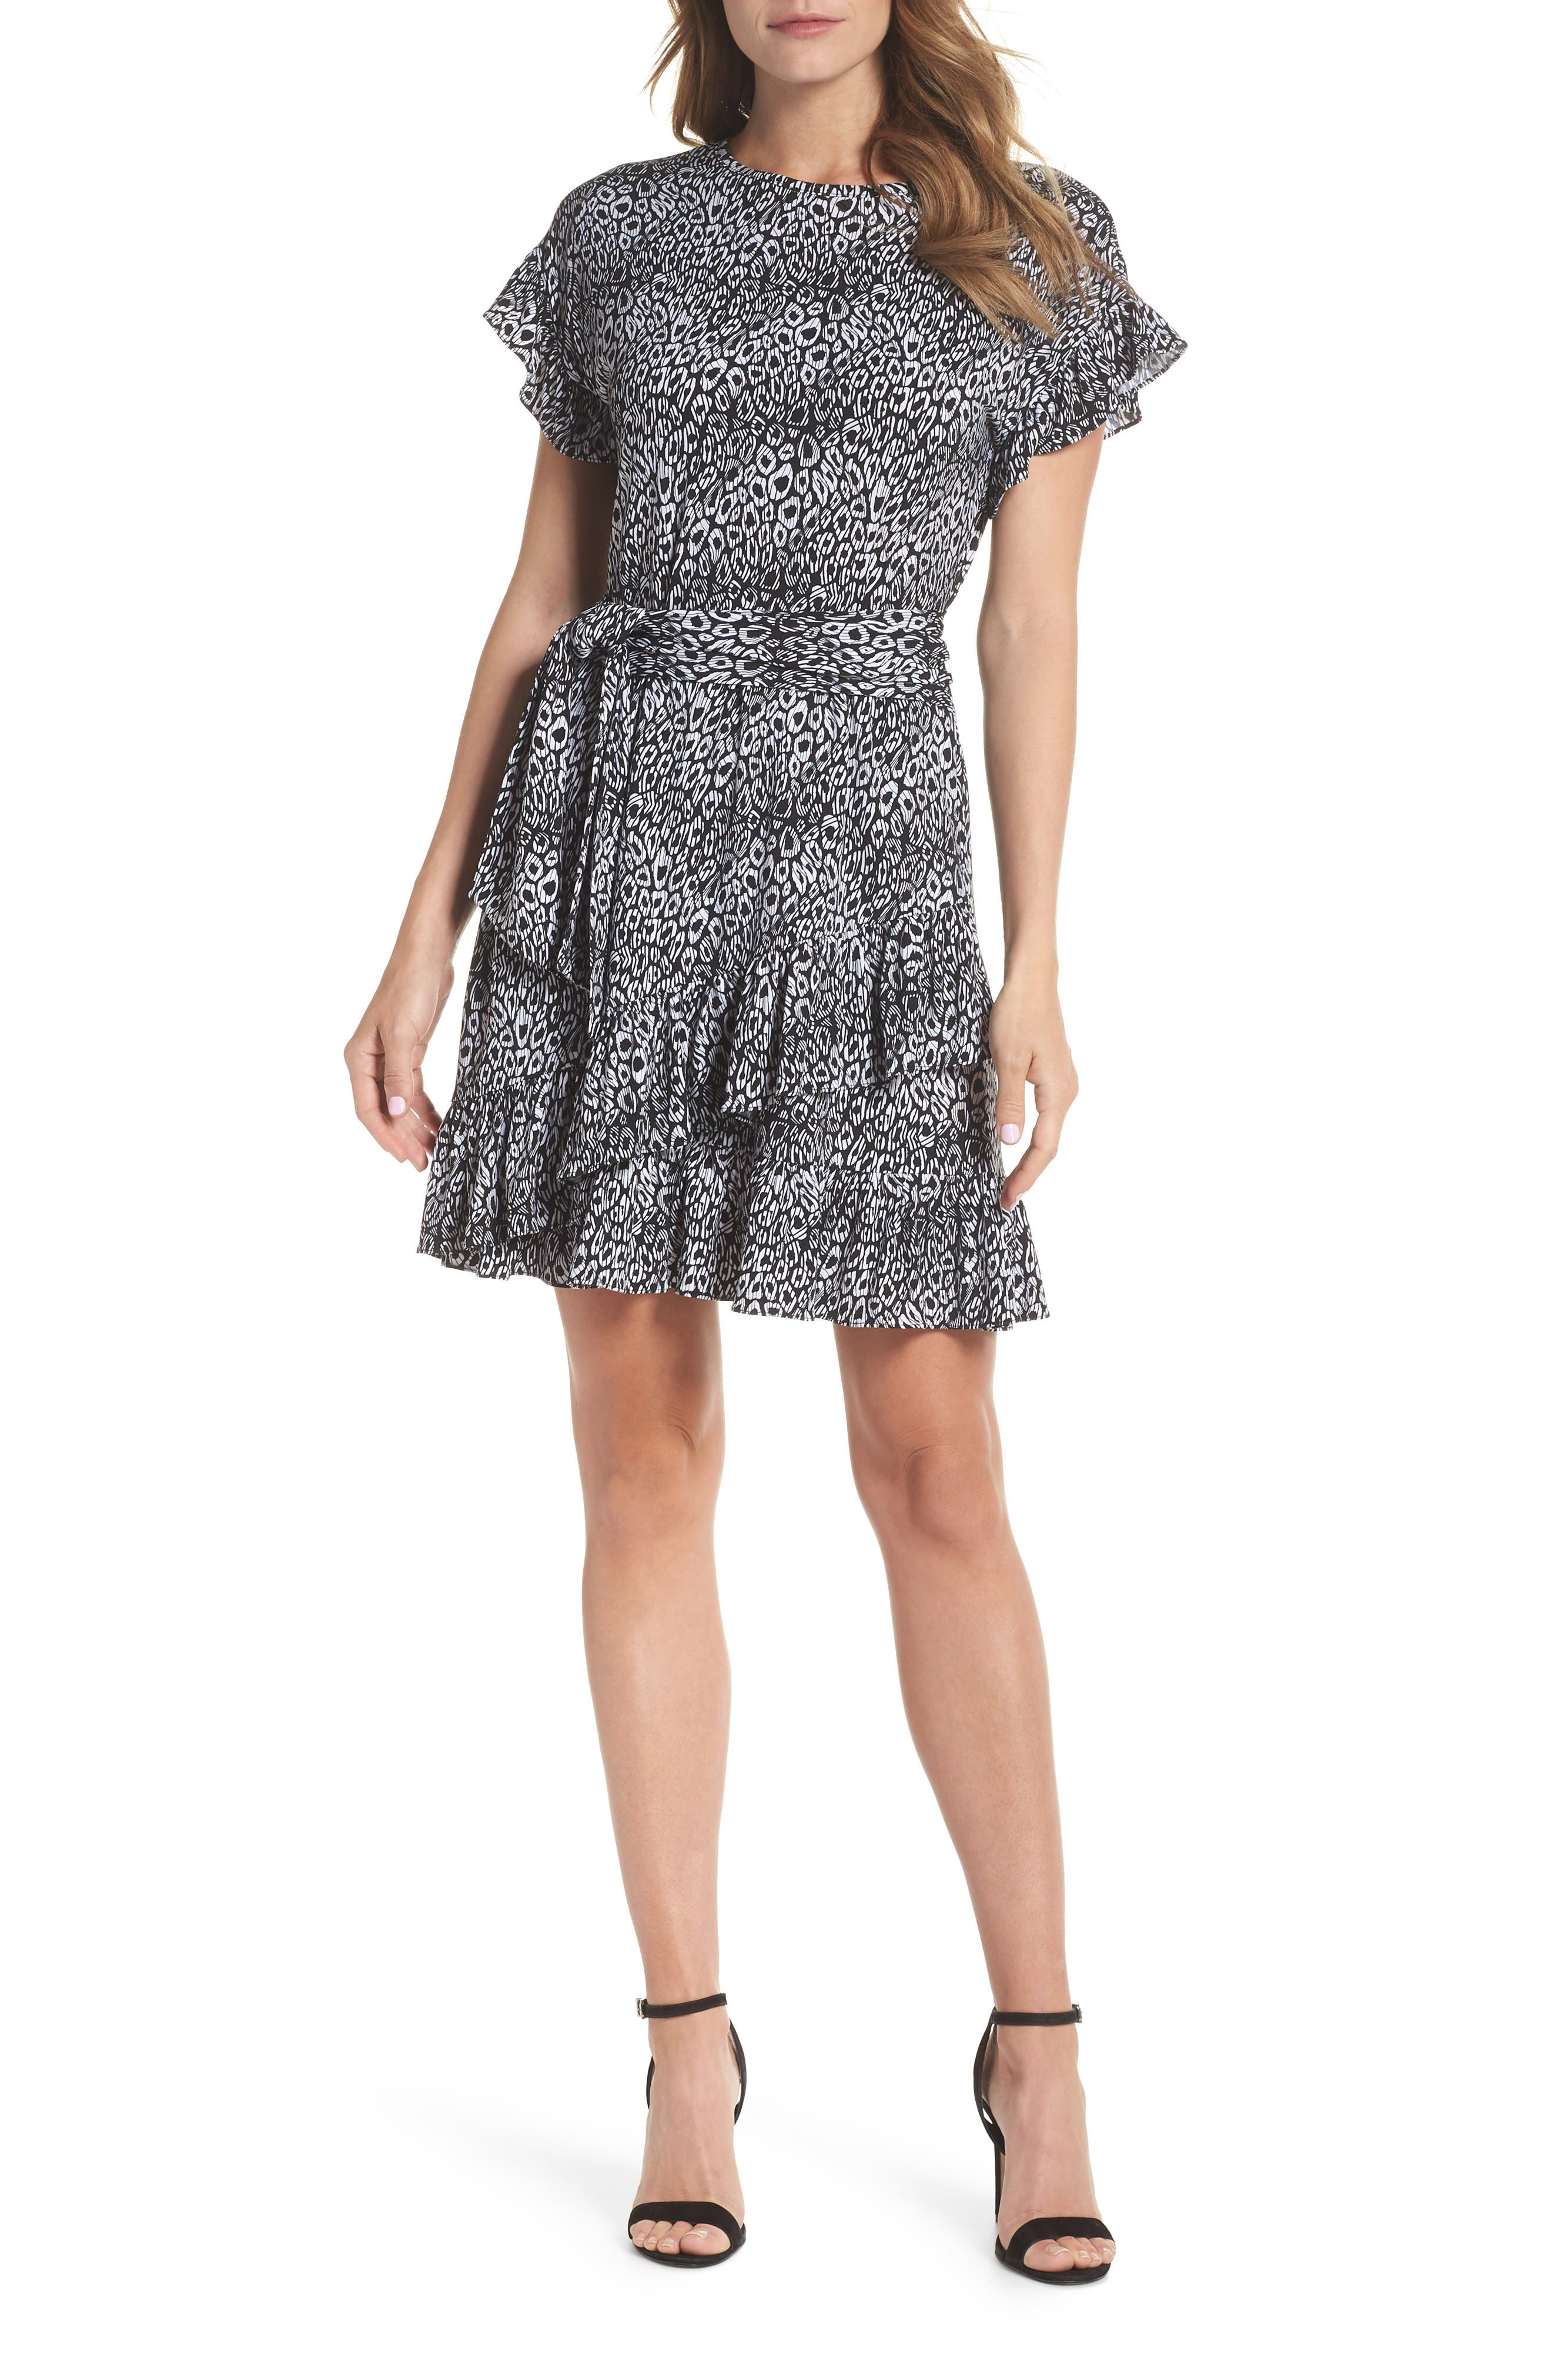 Wavy Leopard Print Ruffle Dress,                             Main thumbnail 1, color,                             Black/ White